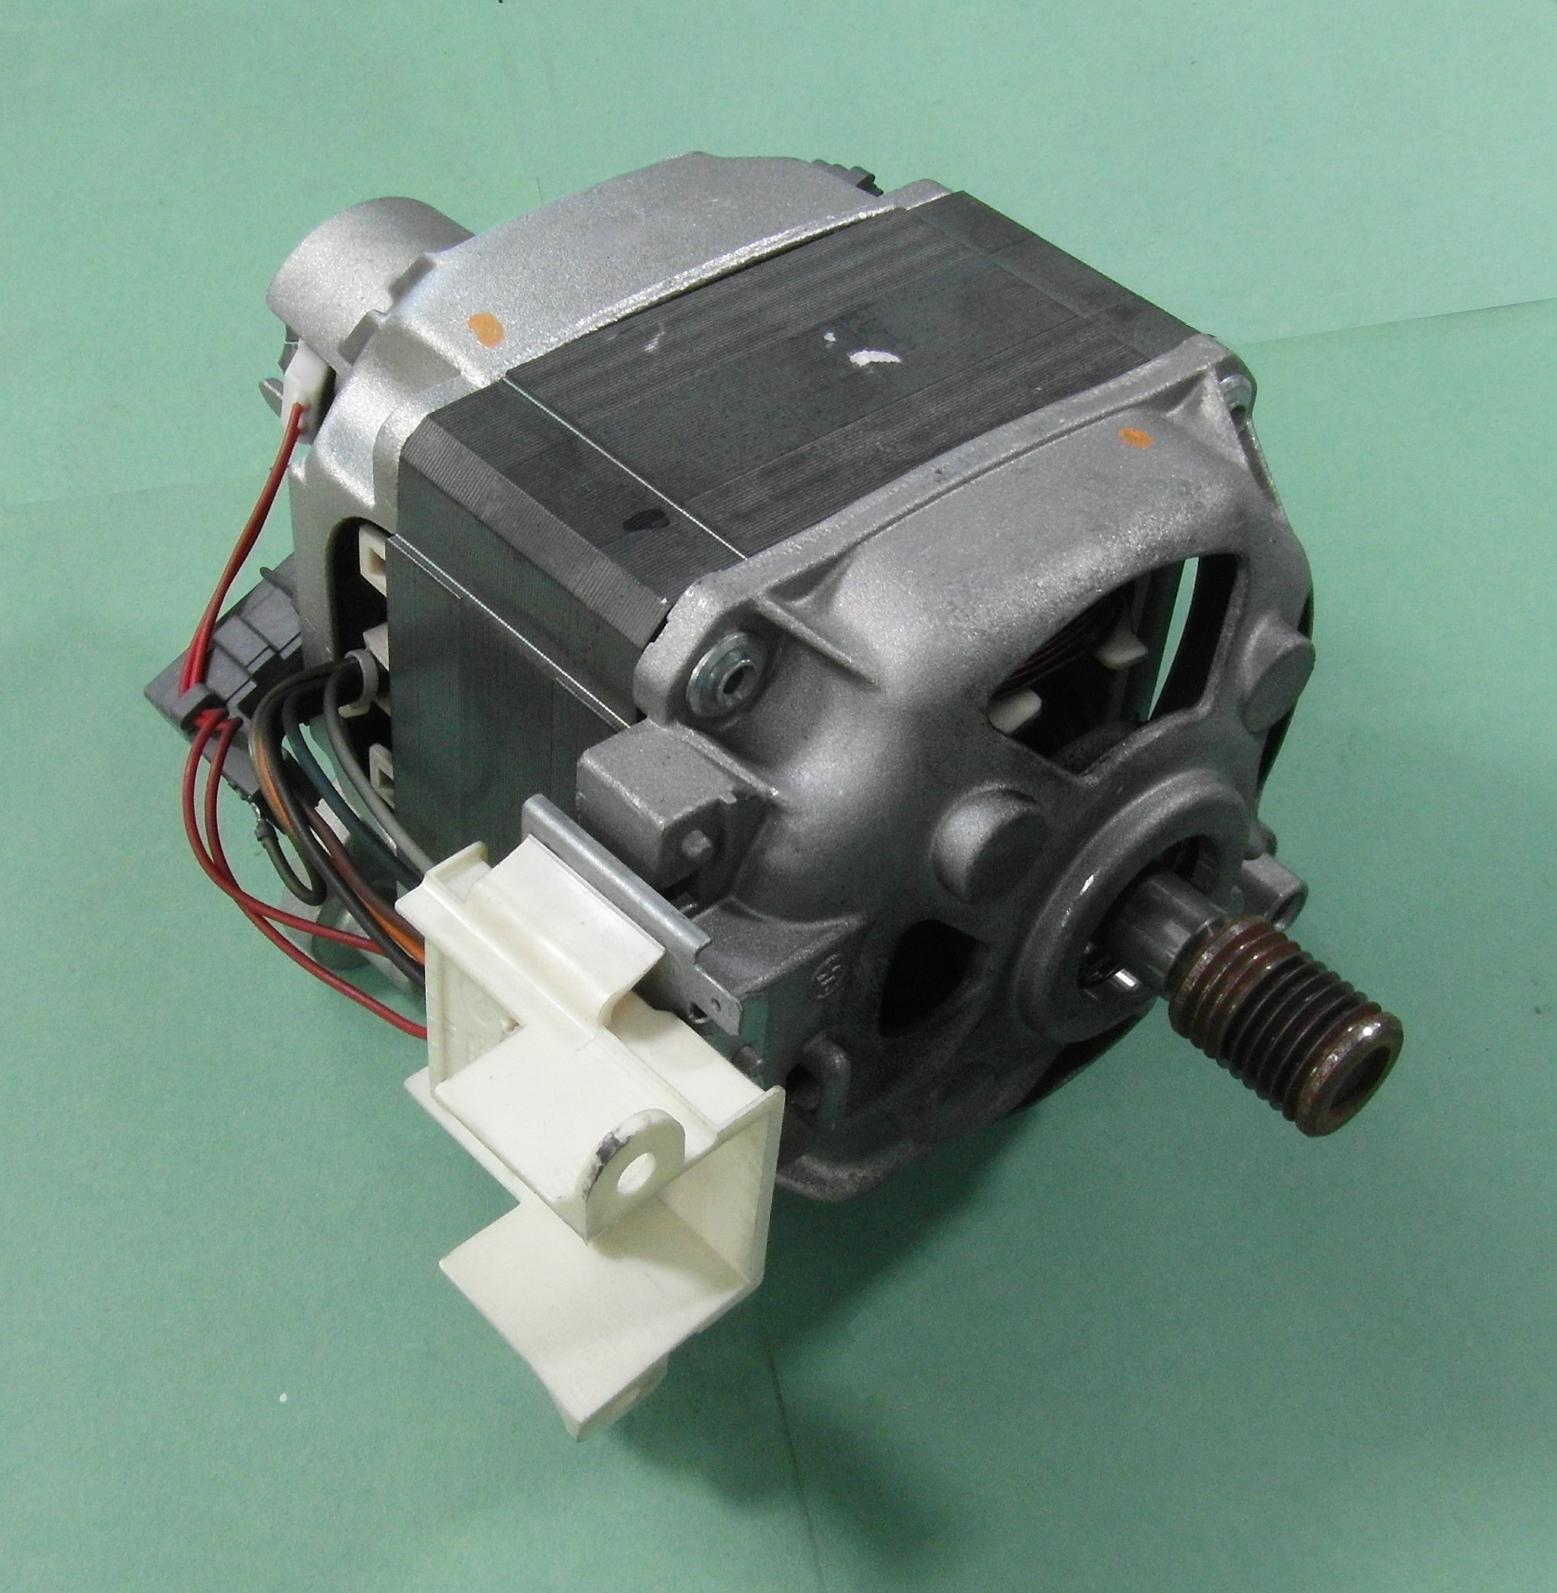 Hotpoint Aquarius Wdl520 Washer Dryer Motor Mca 52 64 148